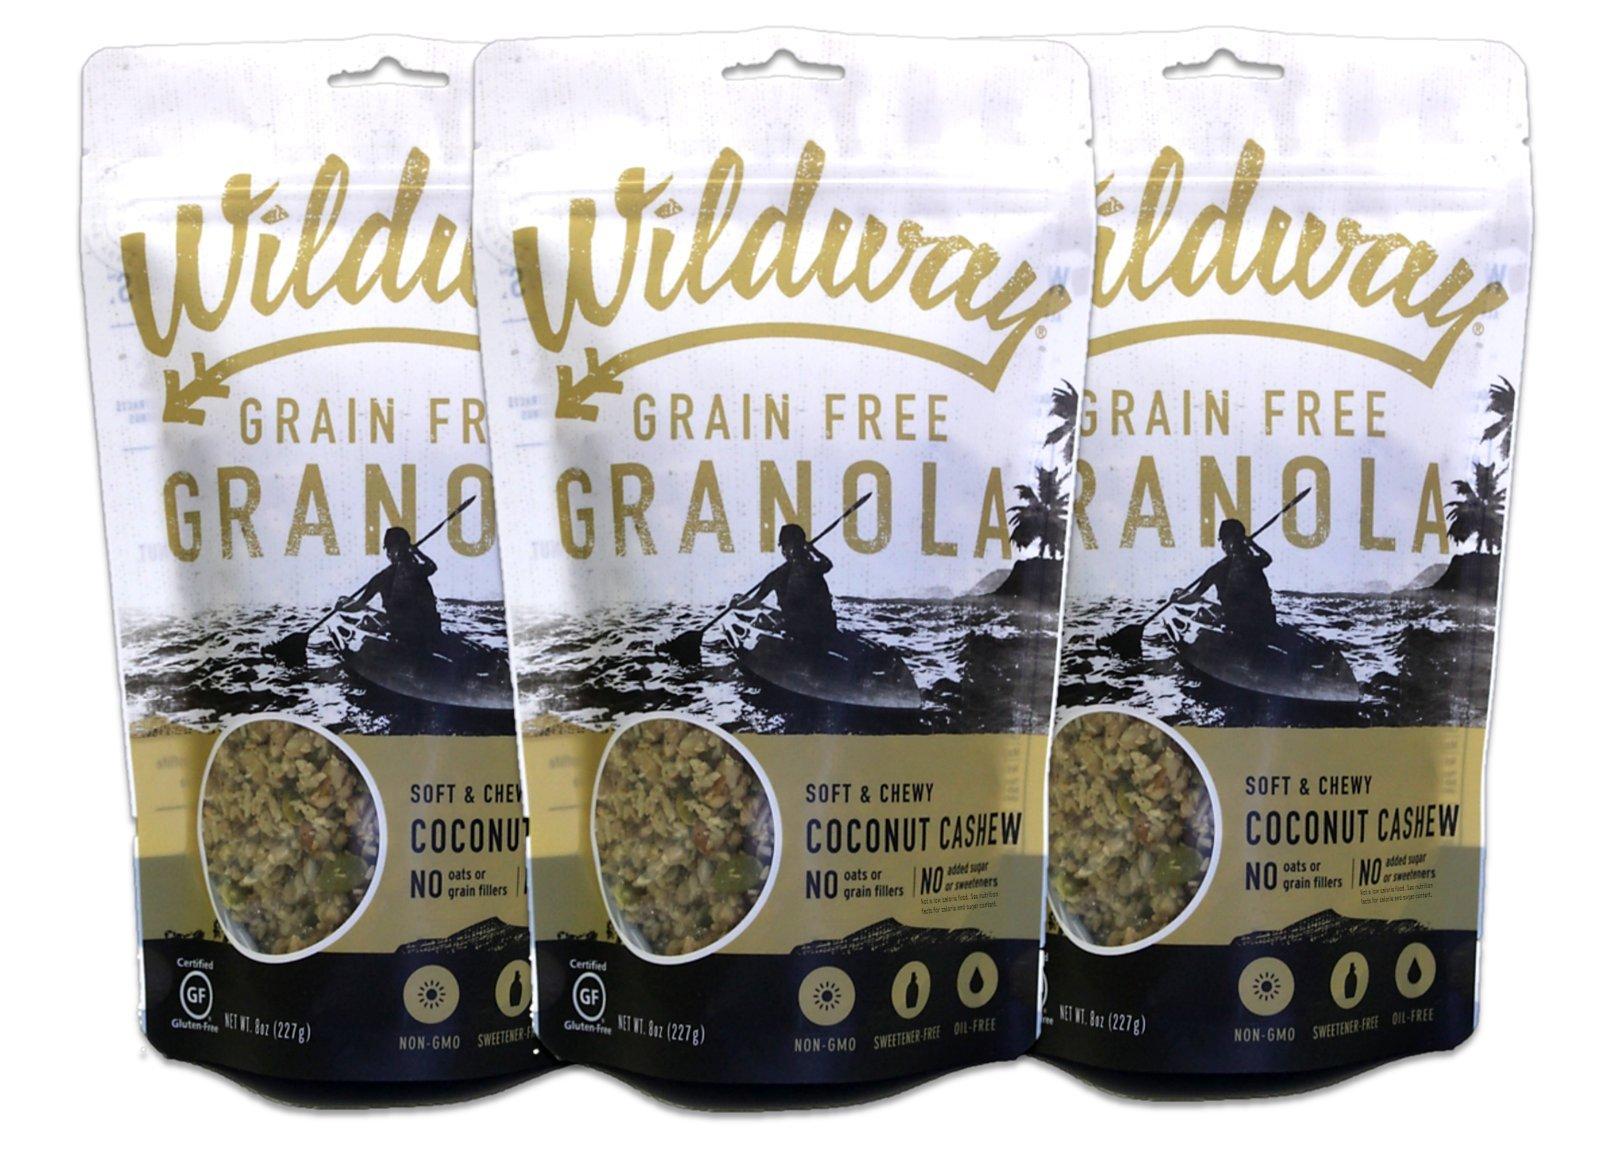 Wildway Coconut Cashew Grain-free Granola, 8oz - 3 Pack (Certified gluten-free, Paleo, Vegan, Non-GMO)